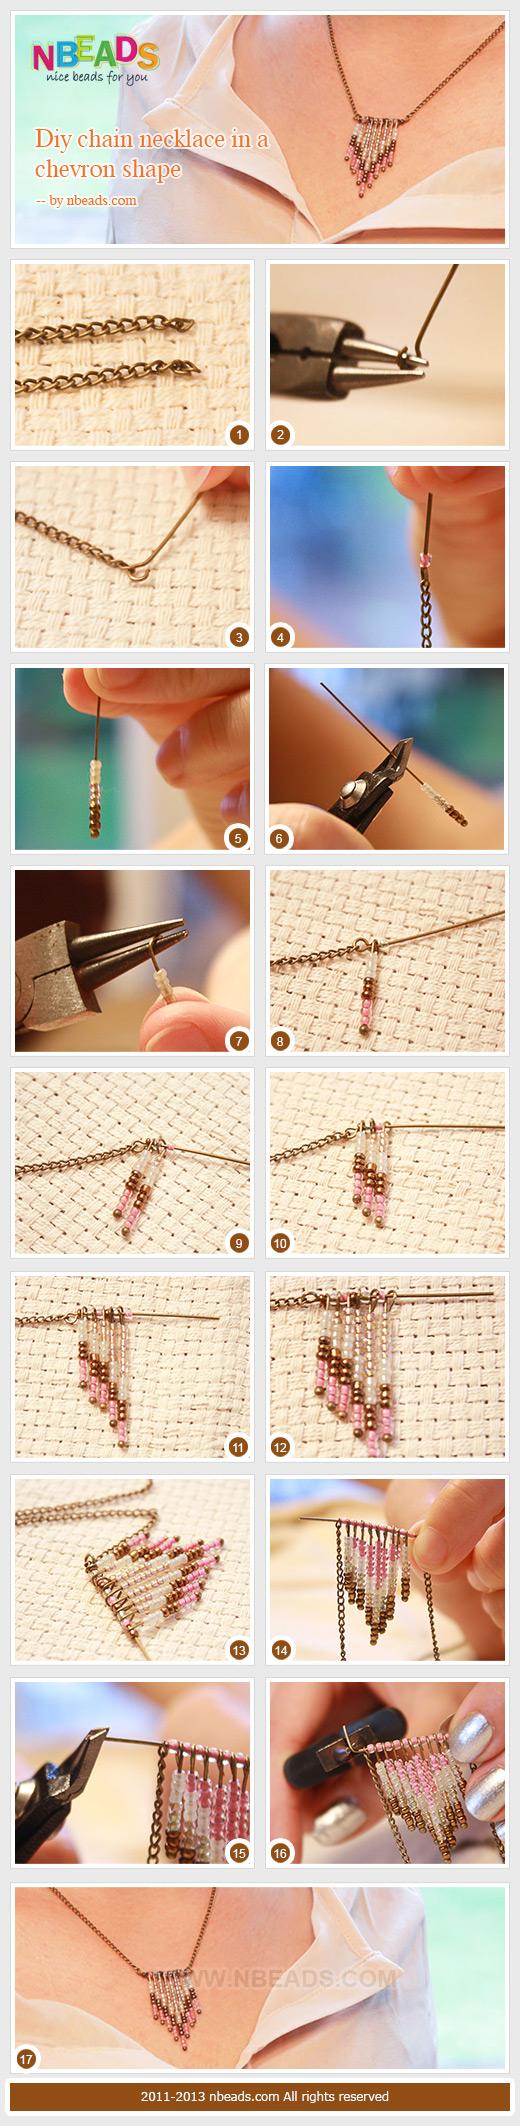 diy chain necklace in a chevron shape